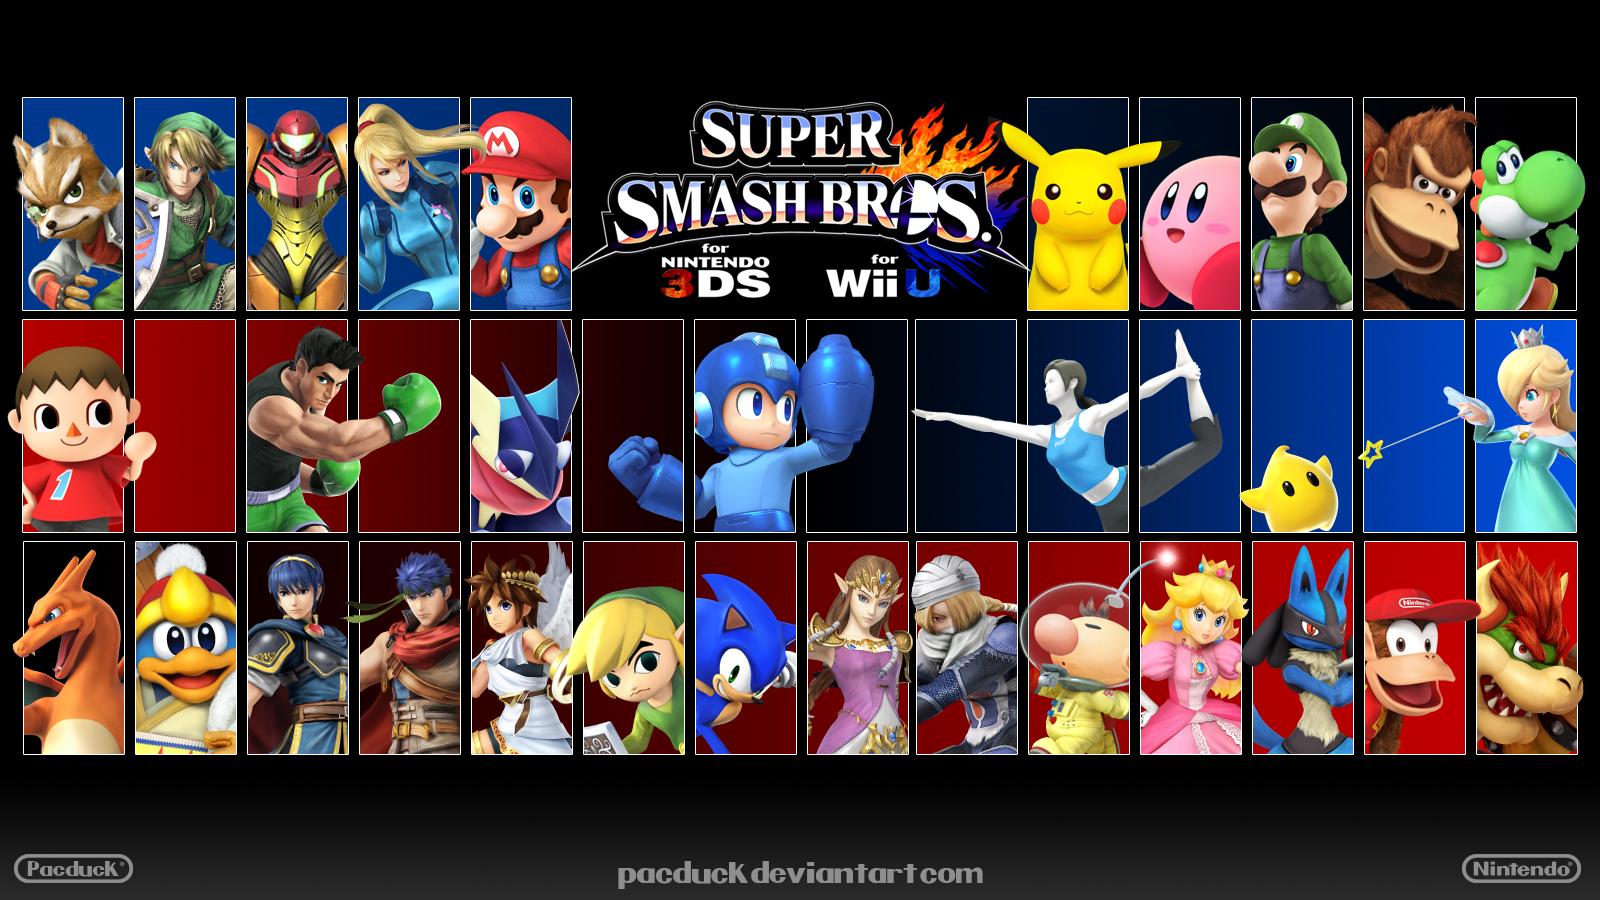 Free download super smash bros wii u 3ds wallpaper 2 by